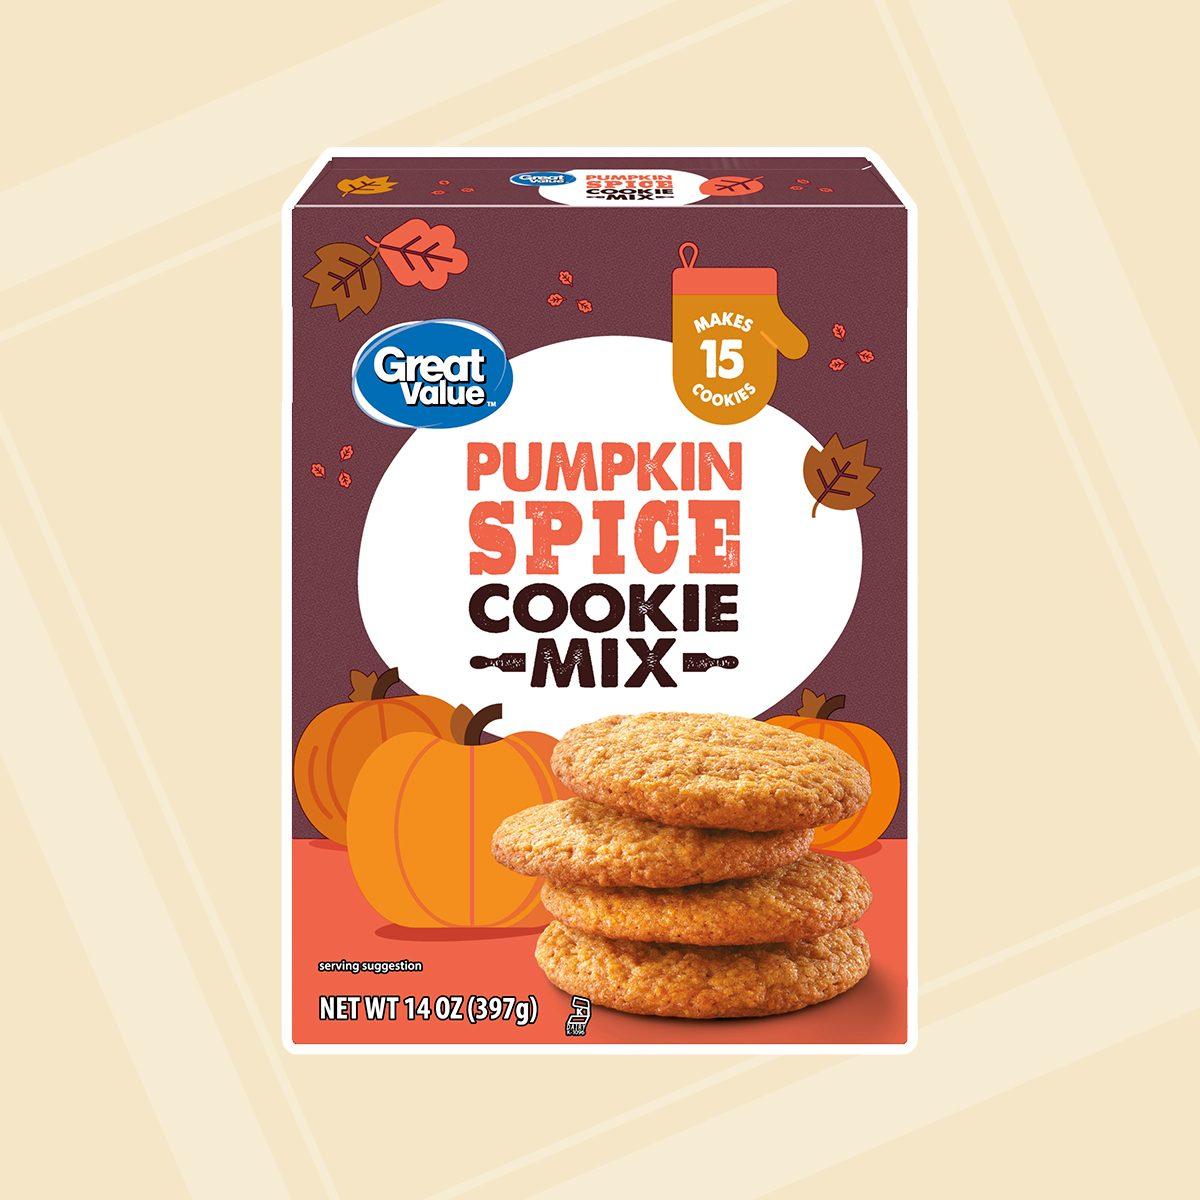 Great Value Pumpkin Spice Pancake & Waffle Mix